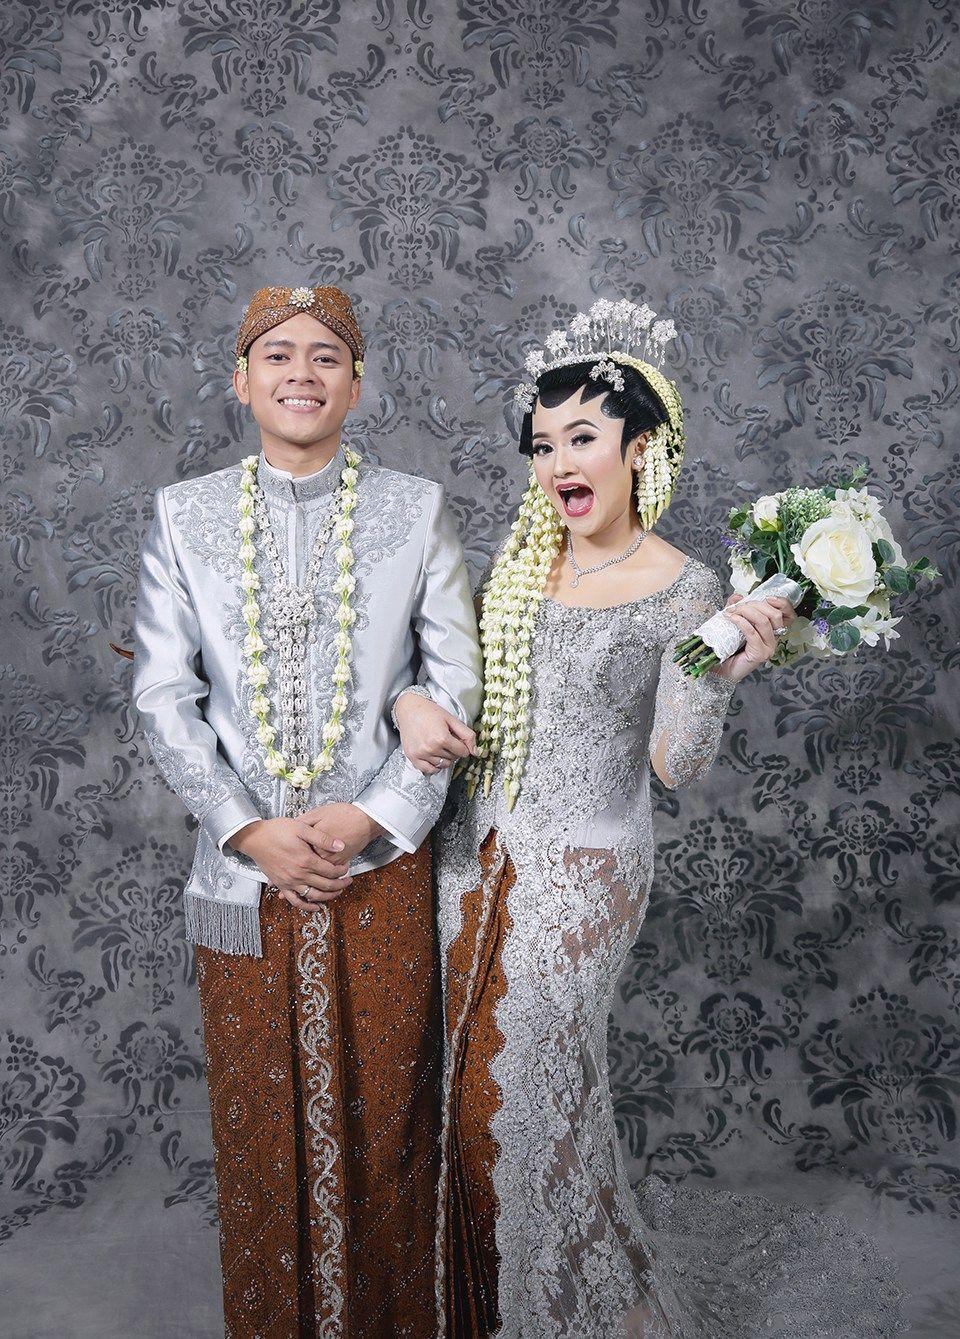 Modern Javanese Wedding Of Alyssa And Heru At Sasana Kriya Foto Perkawinan Gaun Pengantin Sederhana Foto Pengantin